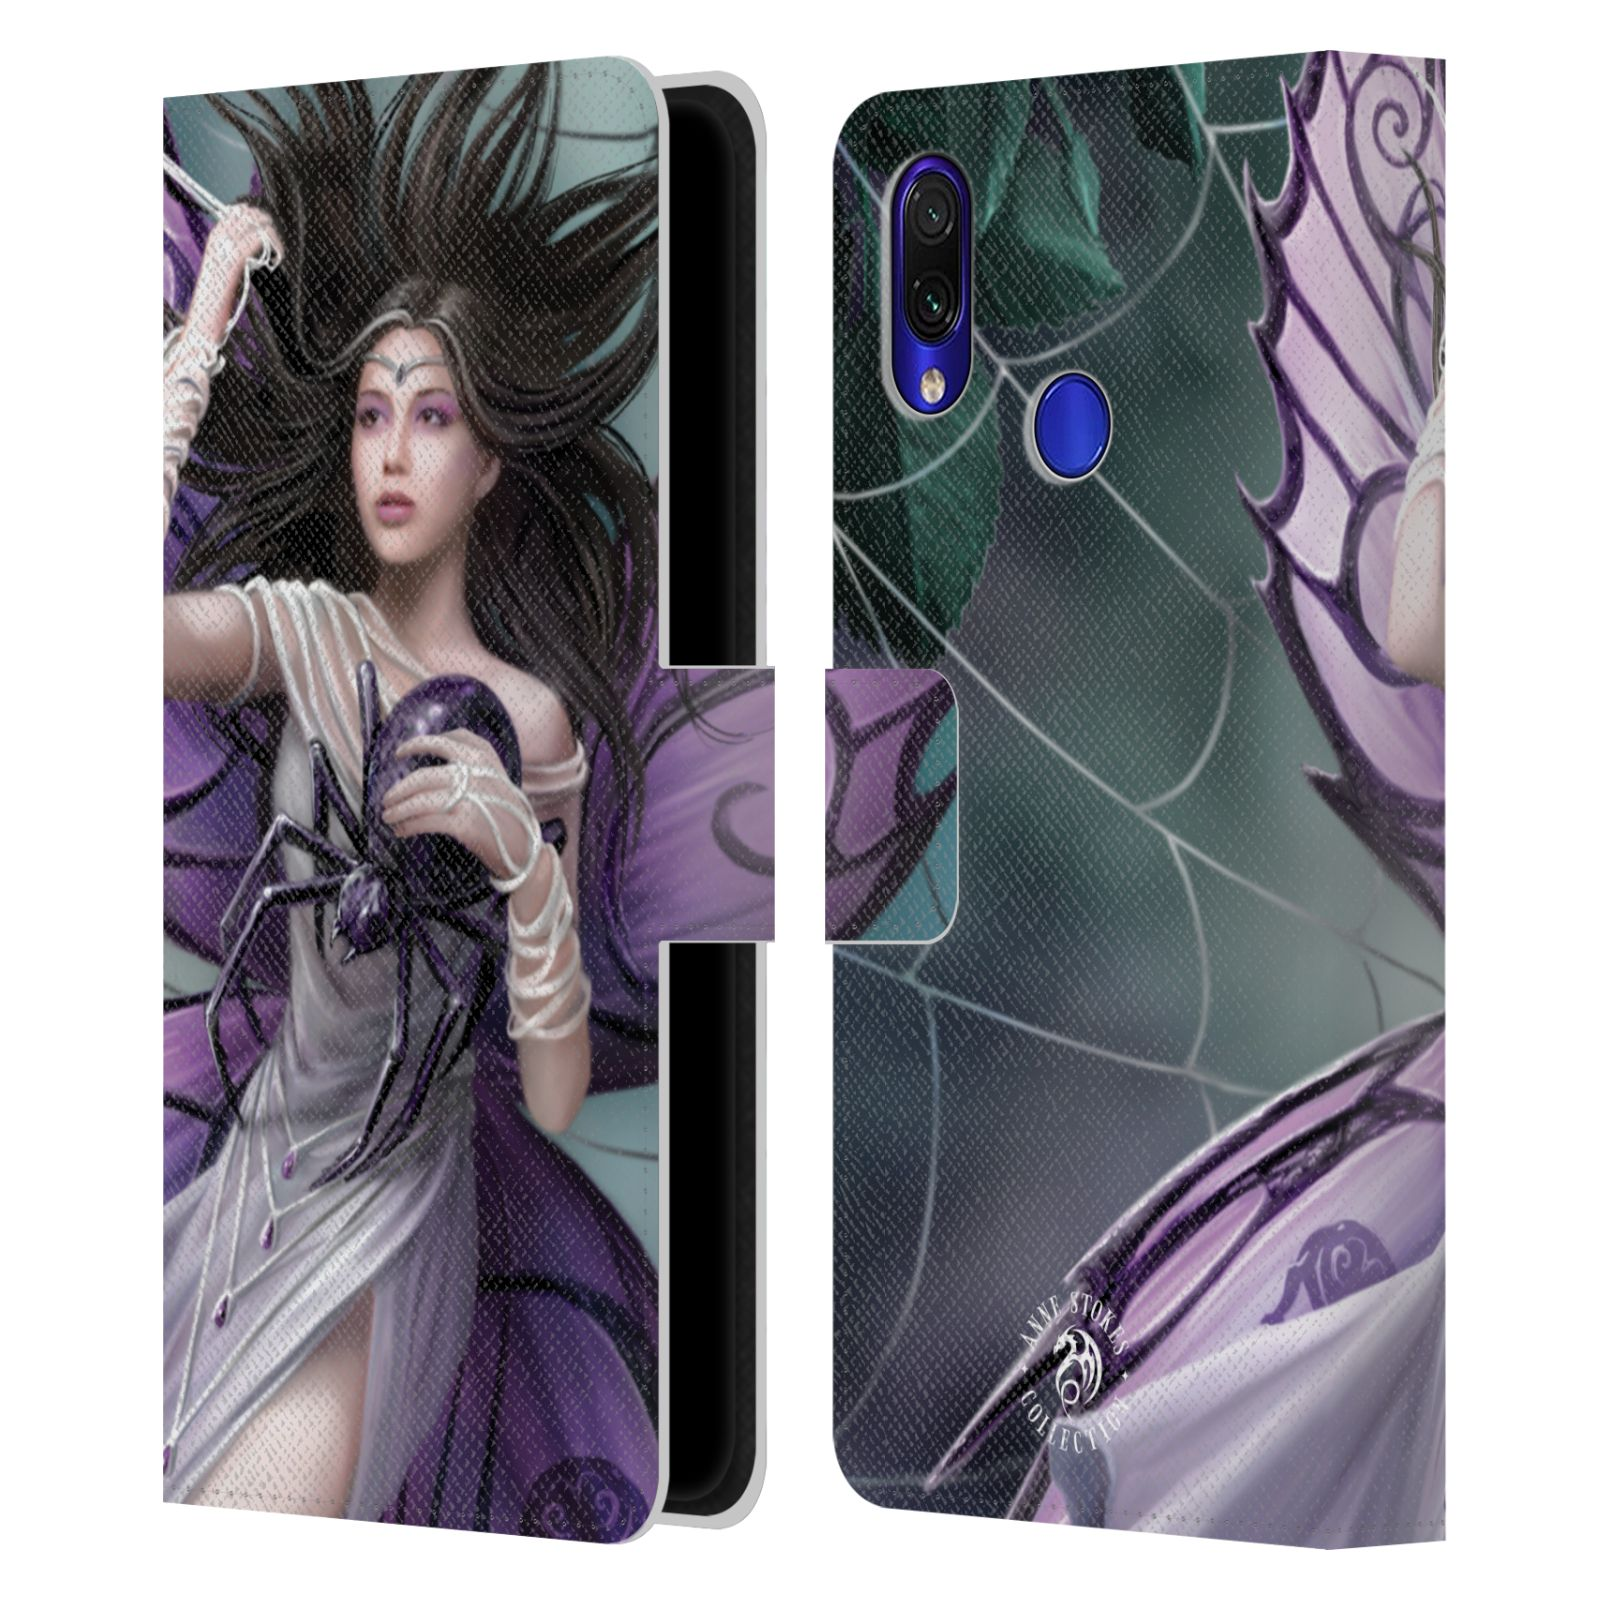 Pouzdro na mobil Xiaomi Redmi Note 7 / Note 7 PRO - Head Case - fantasy - žena svůdnice